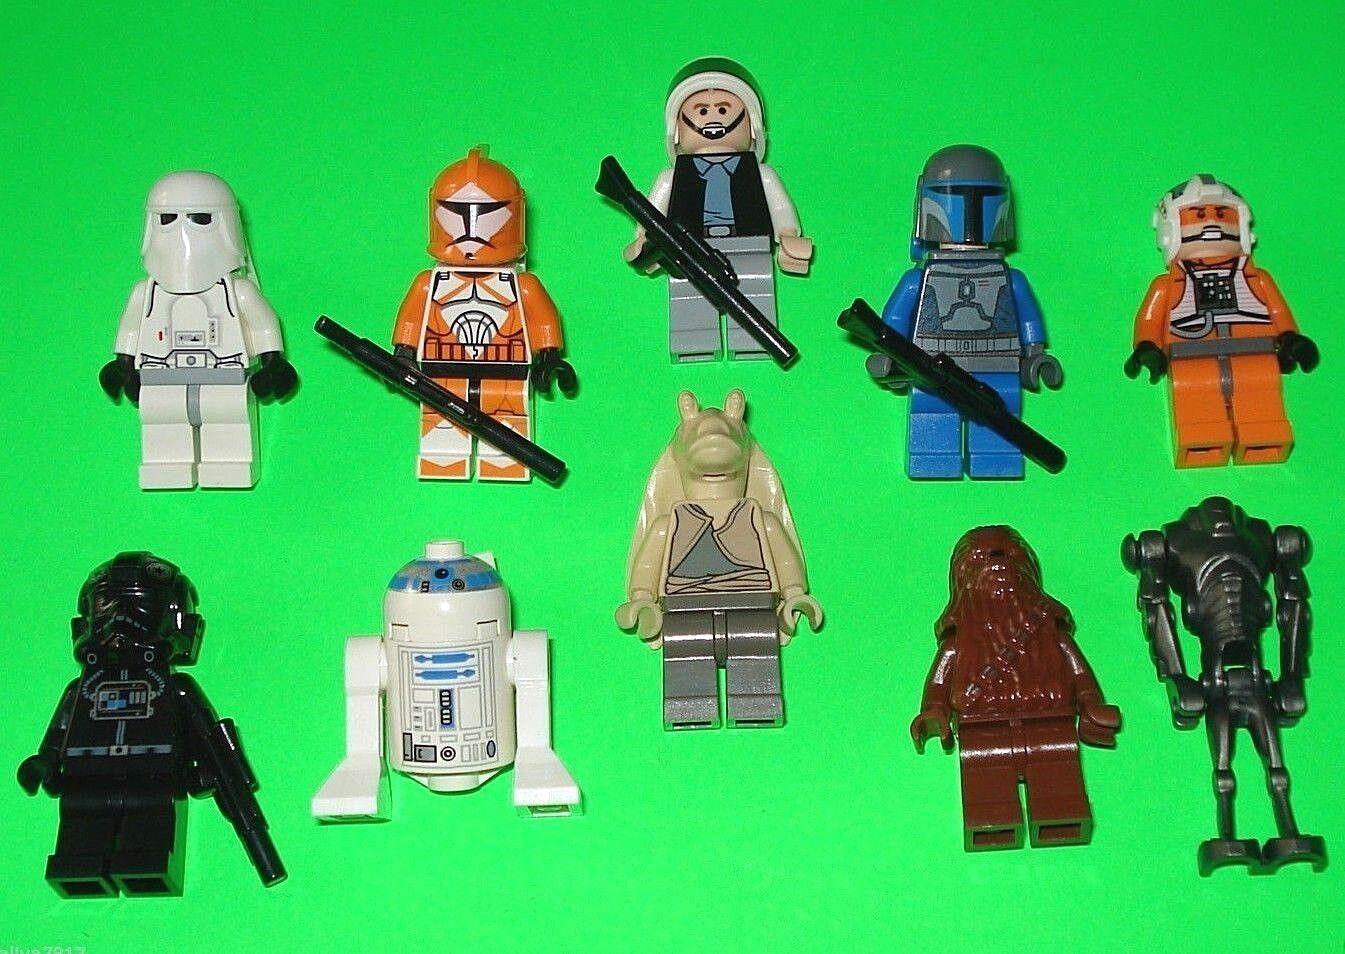 10 LEGO STAR WARS FIGUREN CHEWBACCA - - - DROIDEN - R2-D2 - TROOPER    =TOP b1b3b5